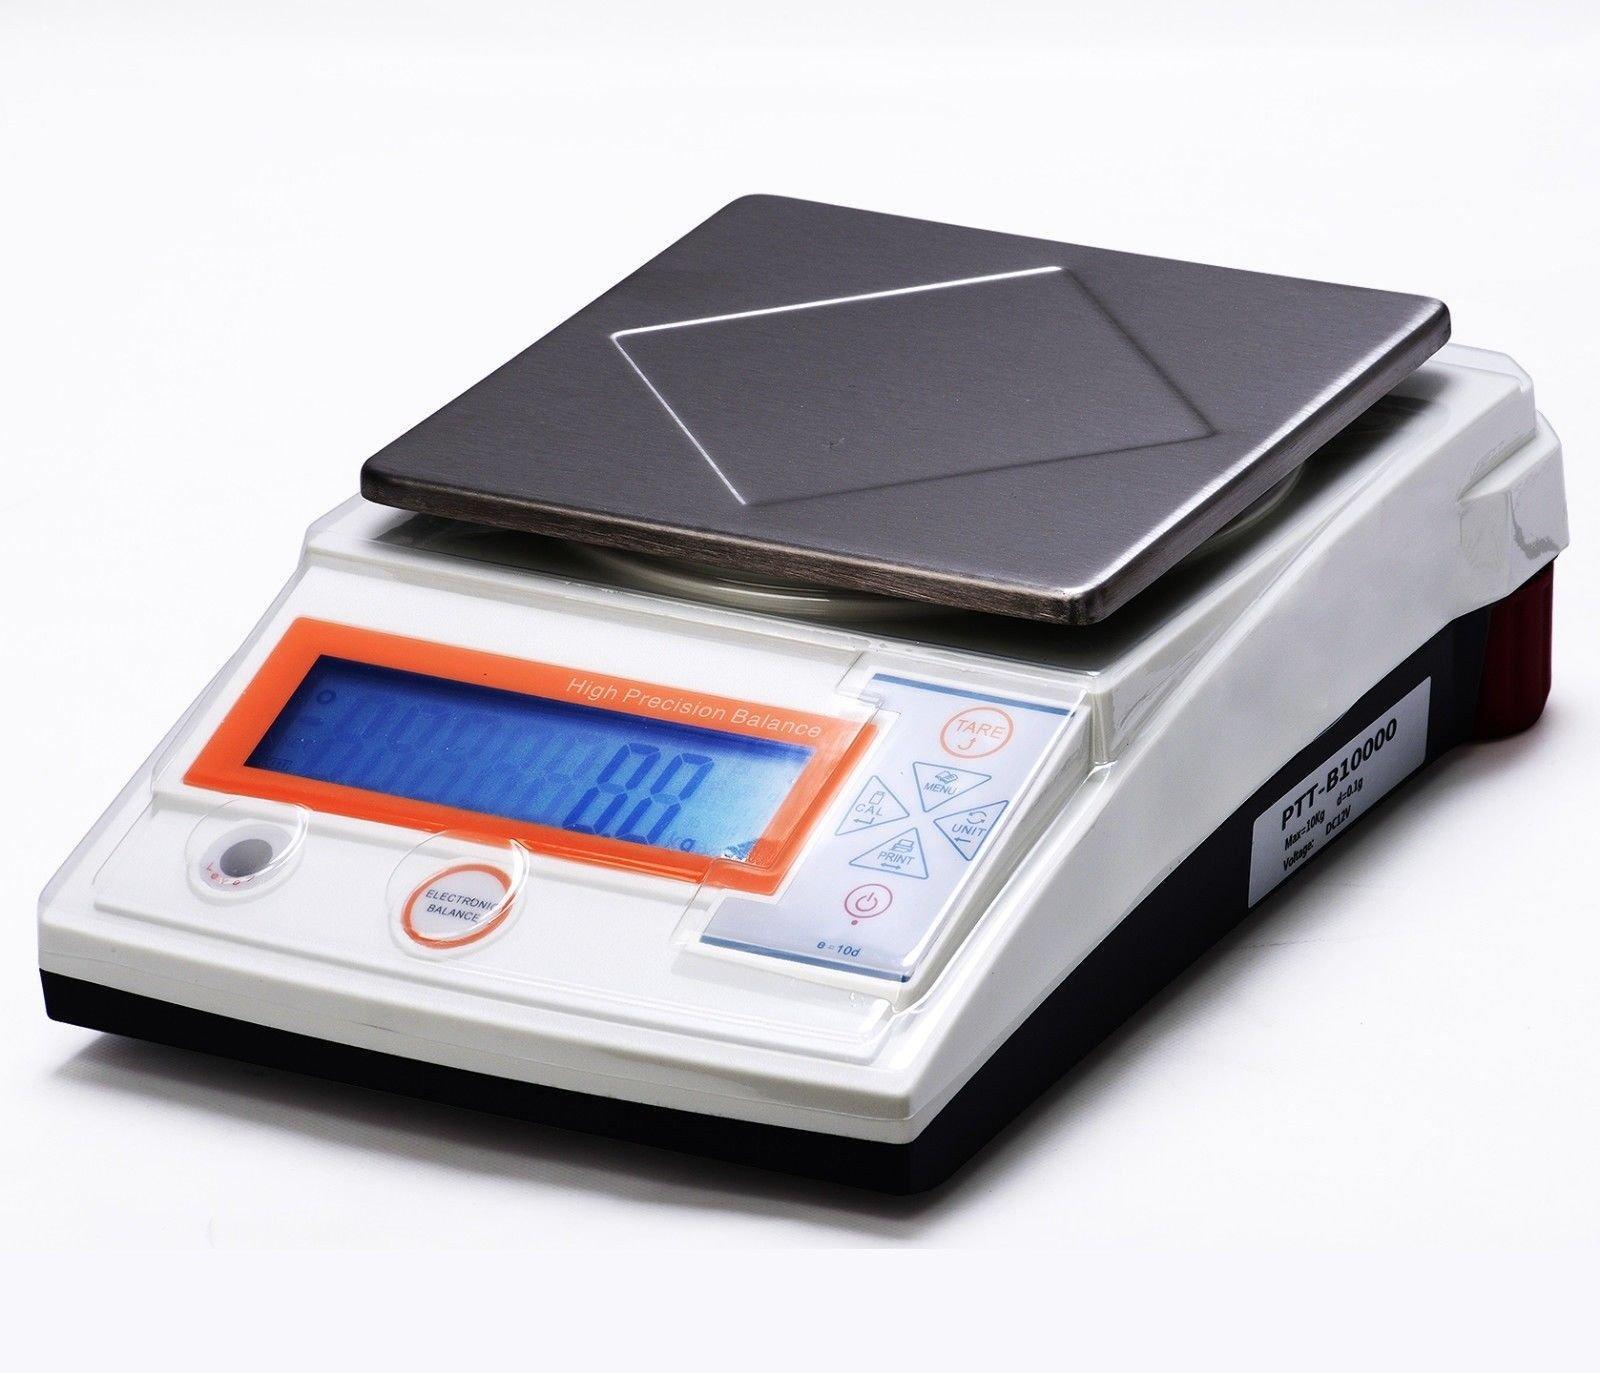 Selleton High Precision Balance Scale With 16 Units/ 10,000G X 0.1G / School, Lab Use